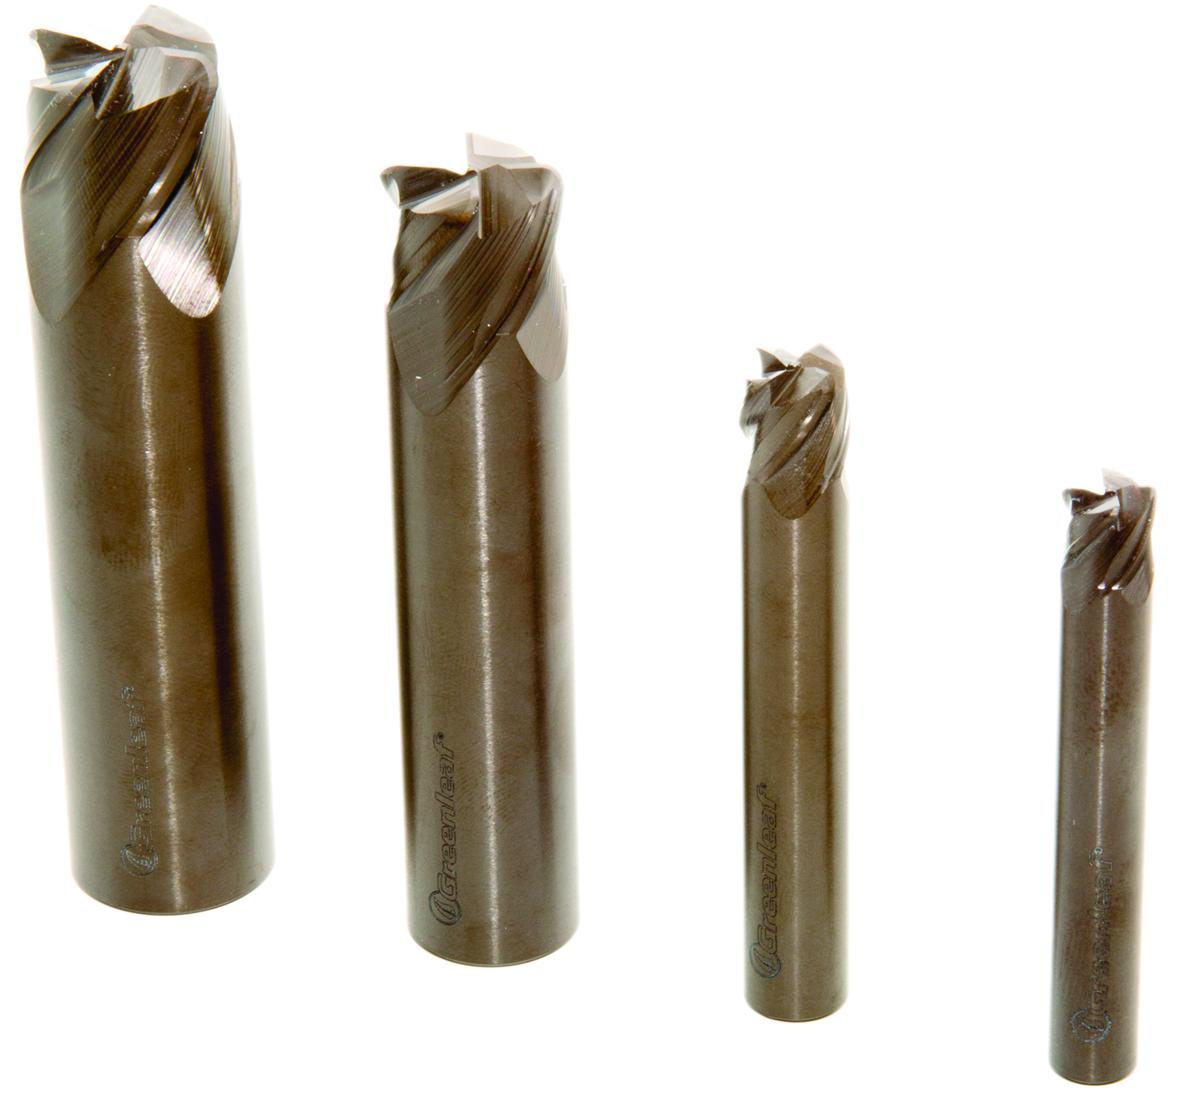 Vollkeramik-Schaftfräser-Serie XSYTIN®-360